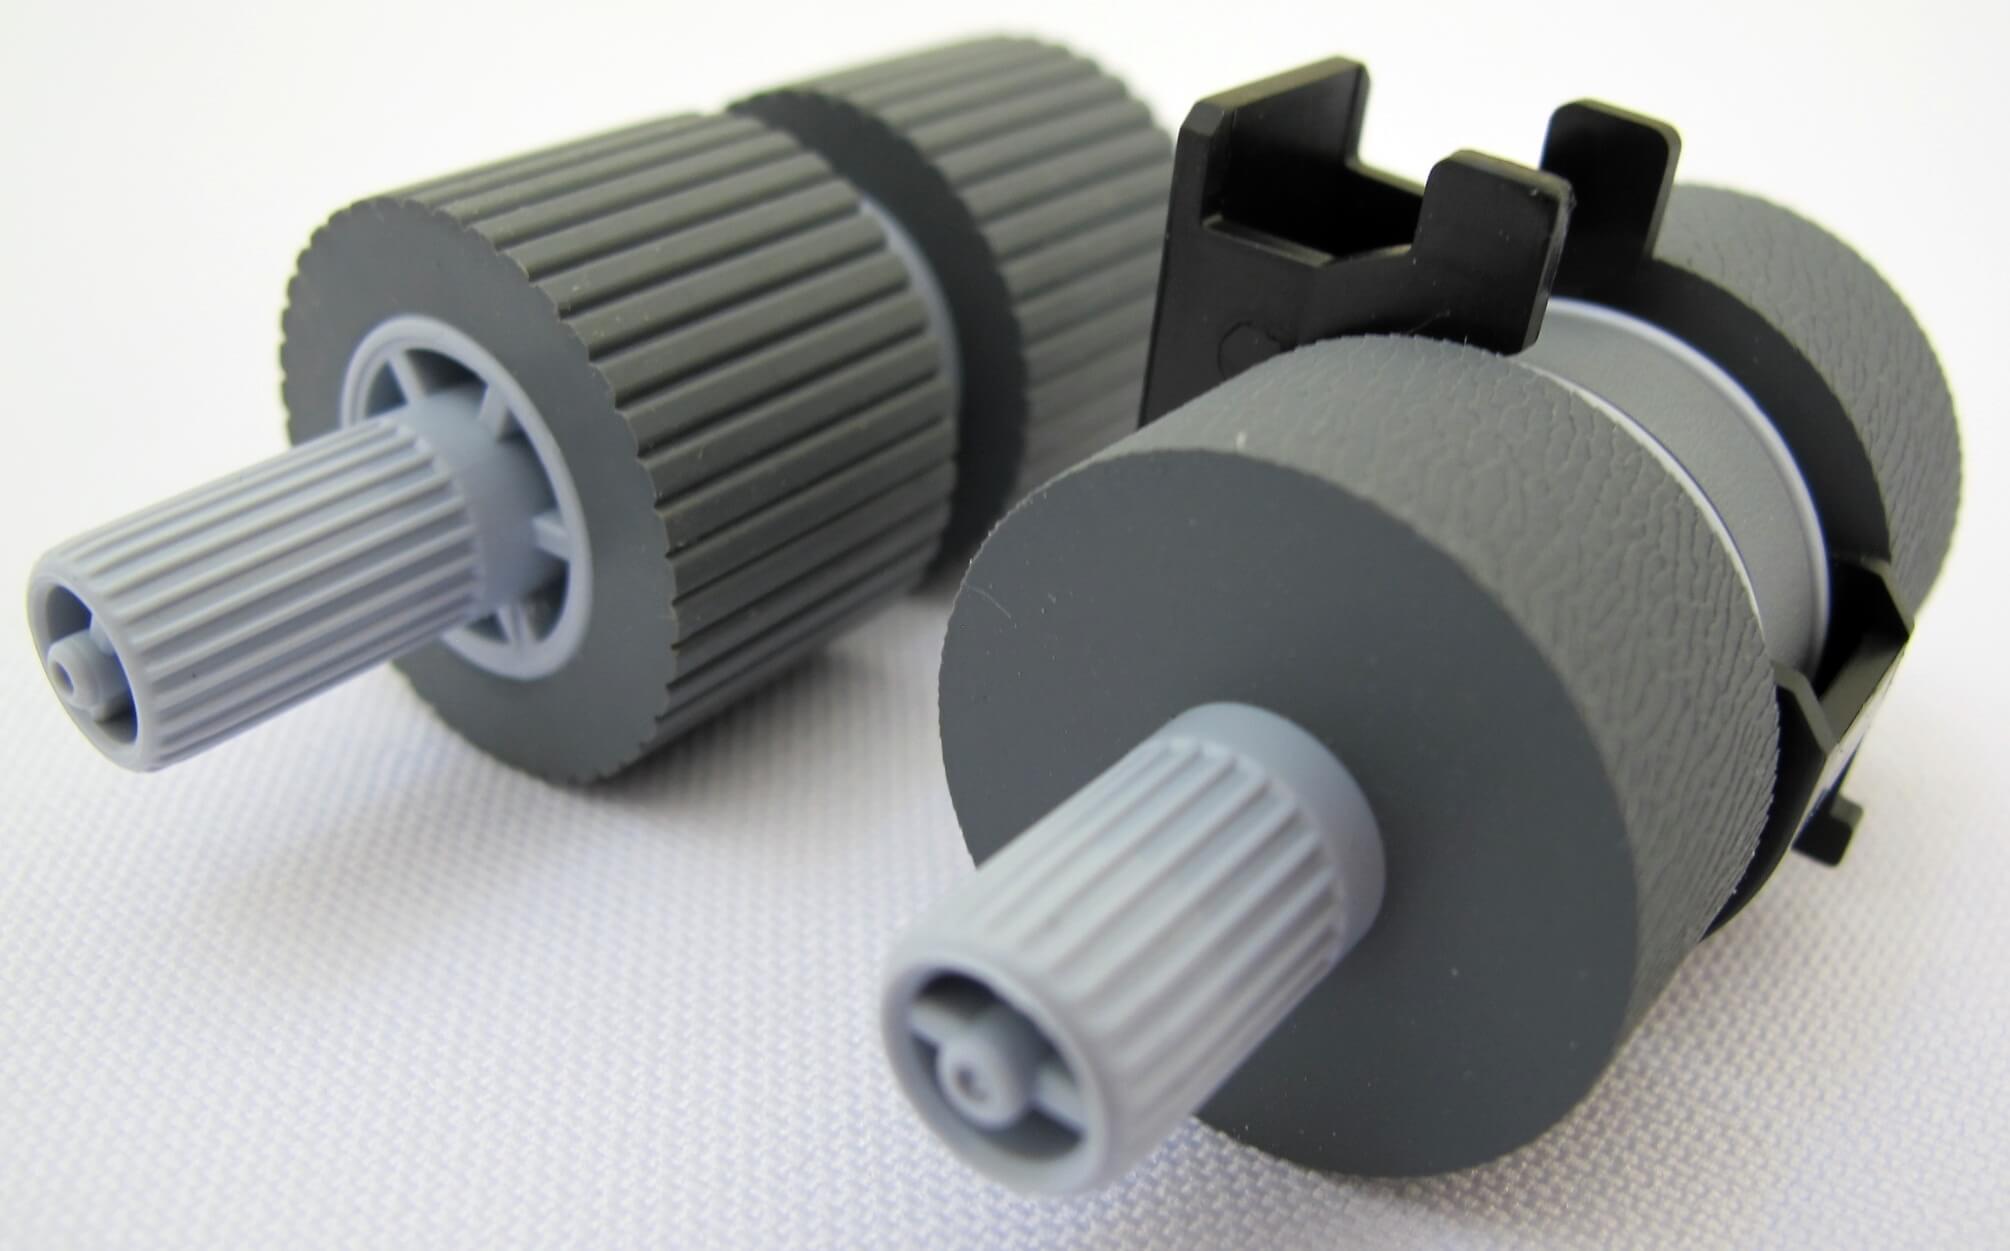 Pick Roller Scanners Fujitsu fi-6670, fi-6770, fi-6750S, fi-5650C e fi-5750C PN: PA03338-K011